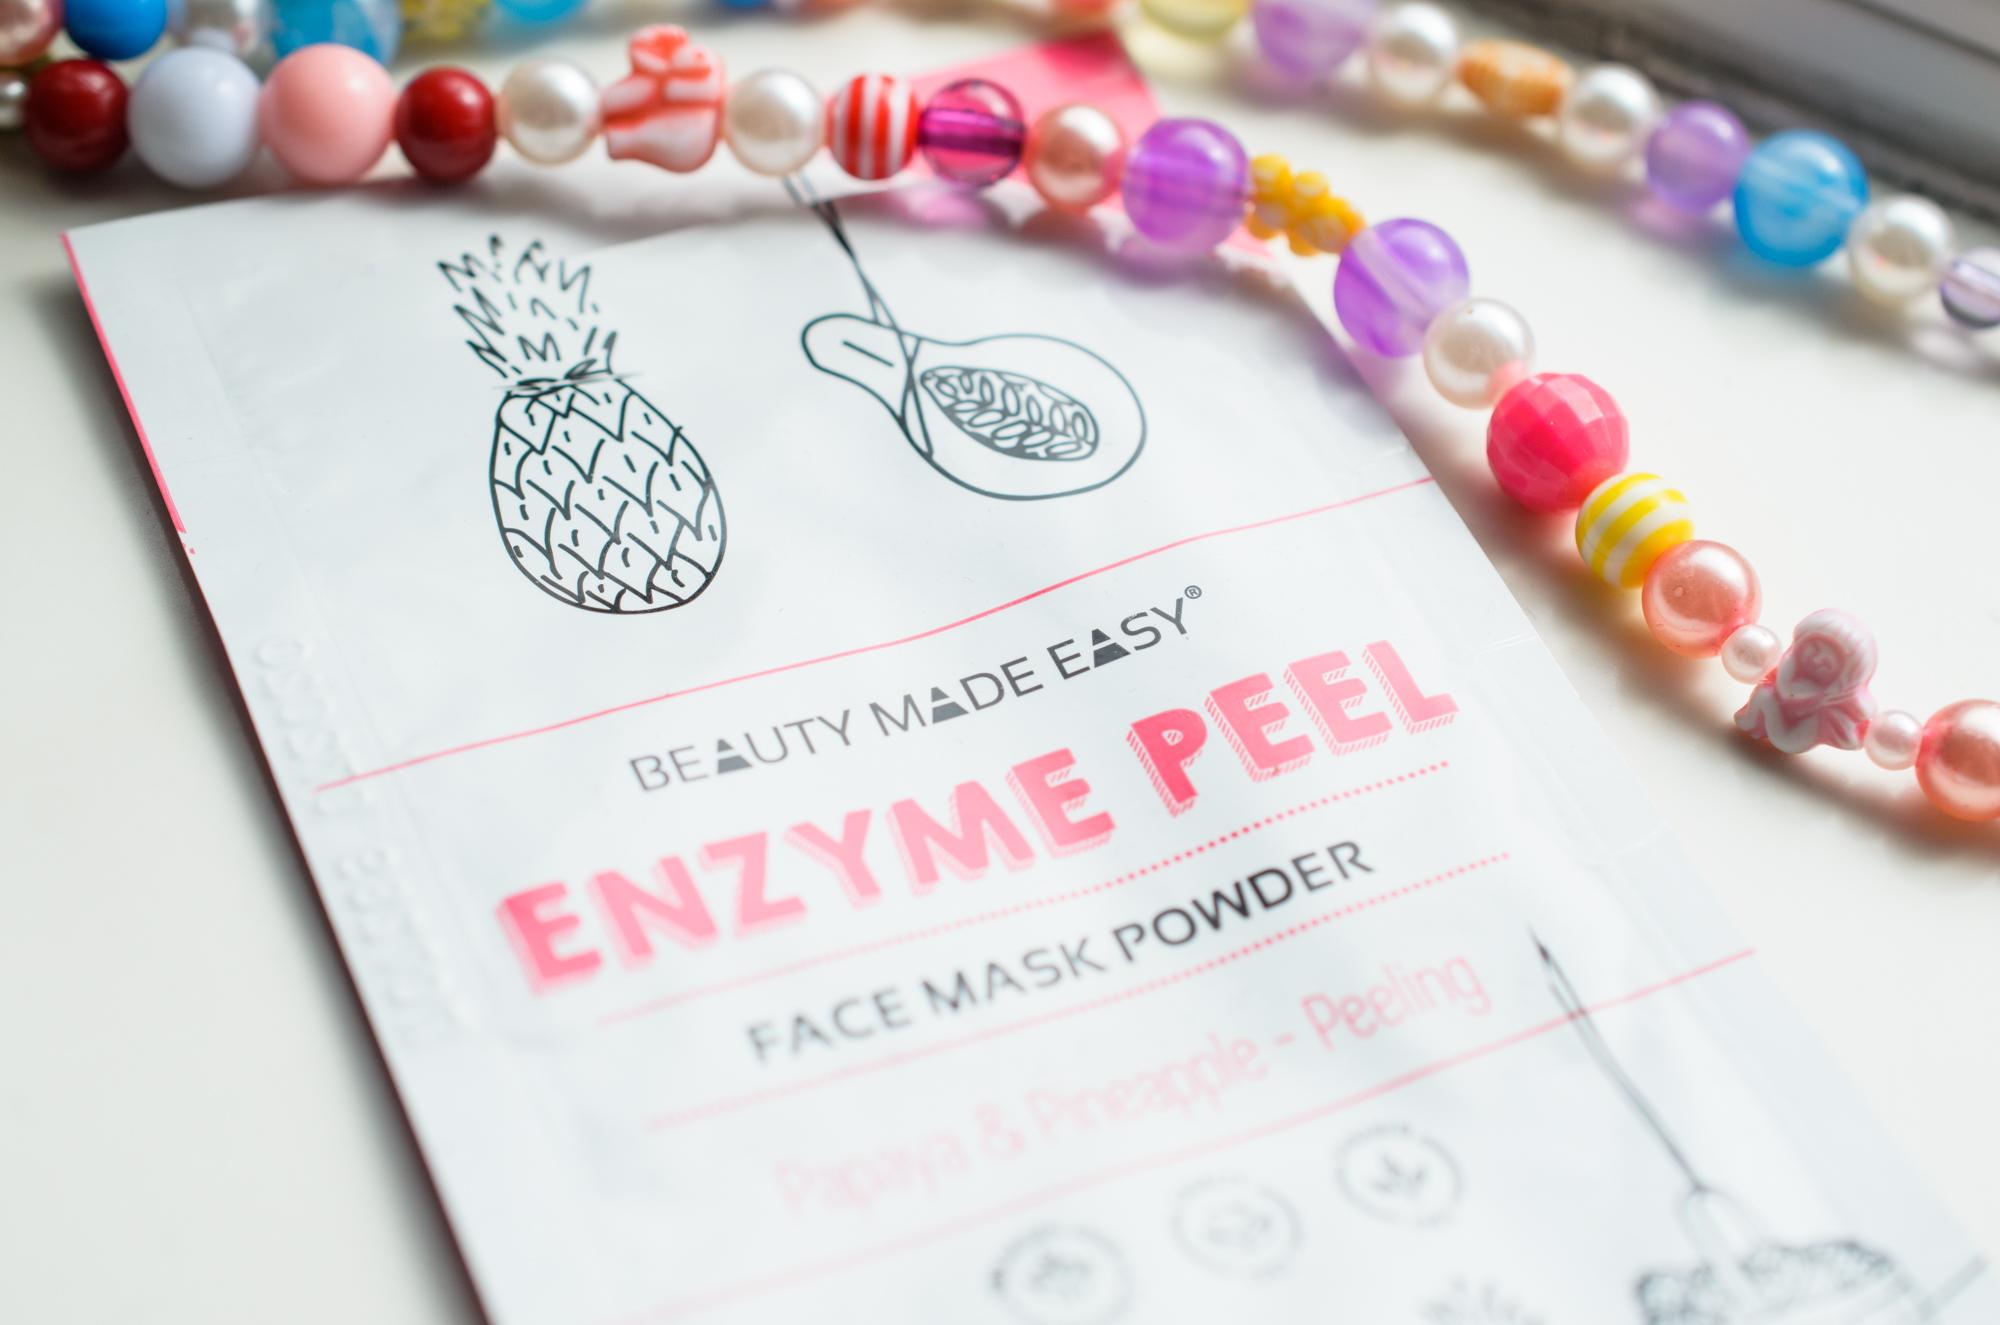 Beauty Made Easy Enzyme Peel